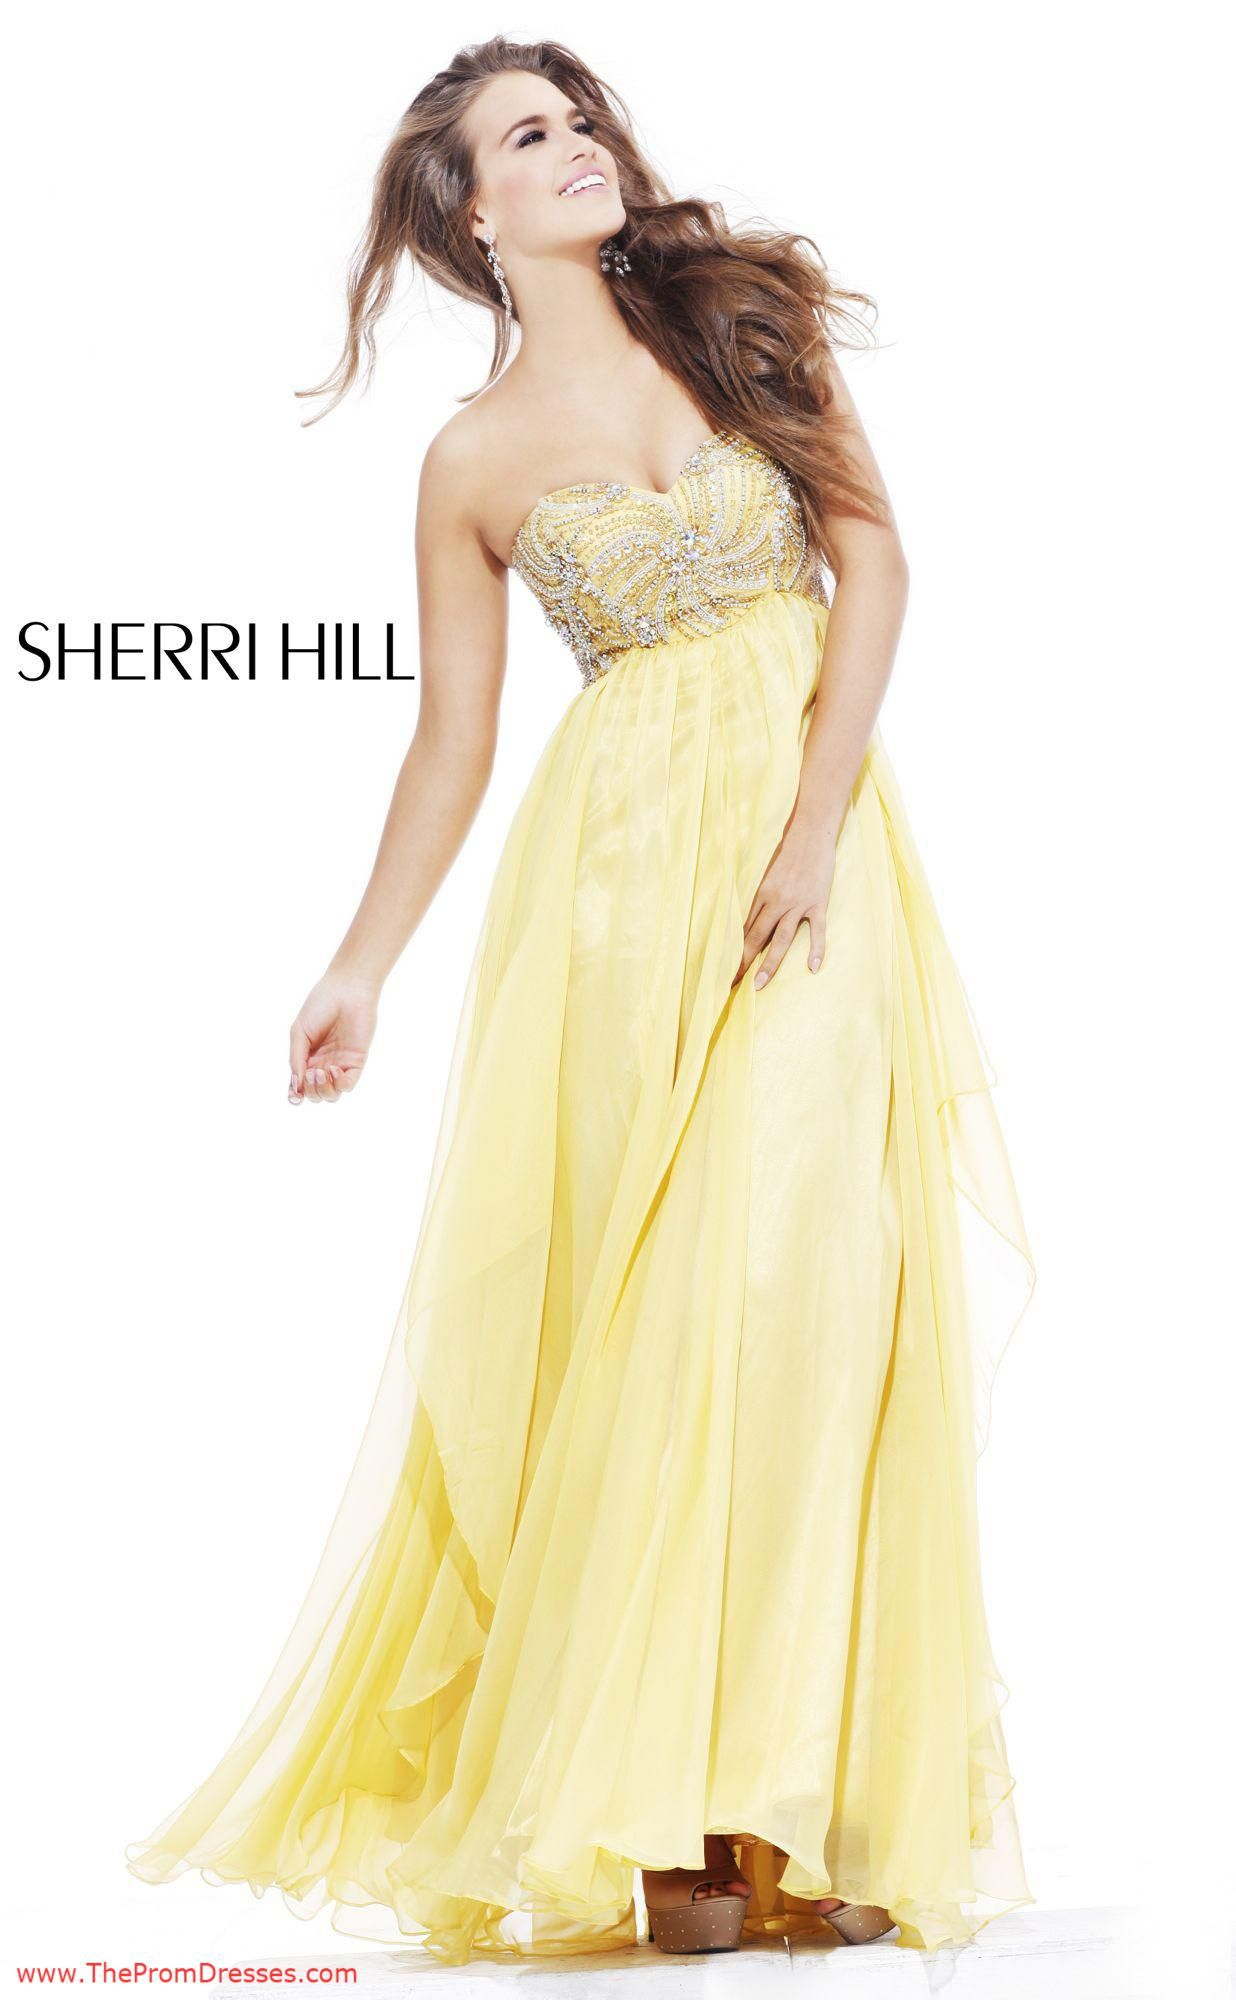 faa54a243e Sherri Hill 3841 - Yellow Prom Dress Size 26  thepromdresses